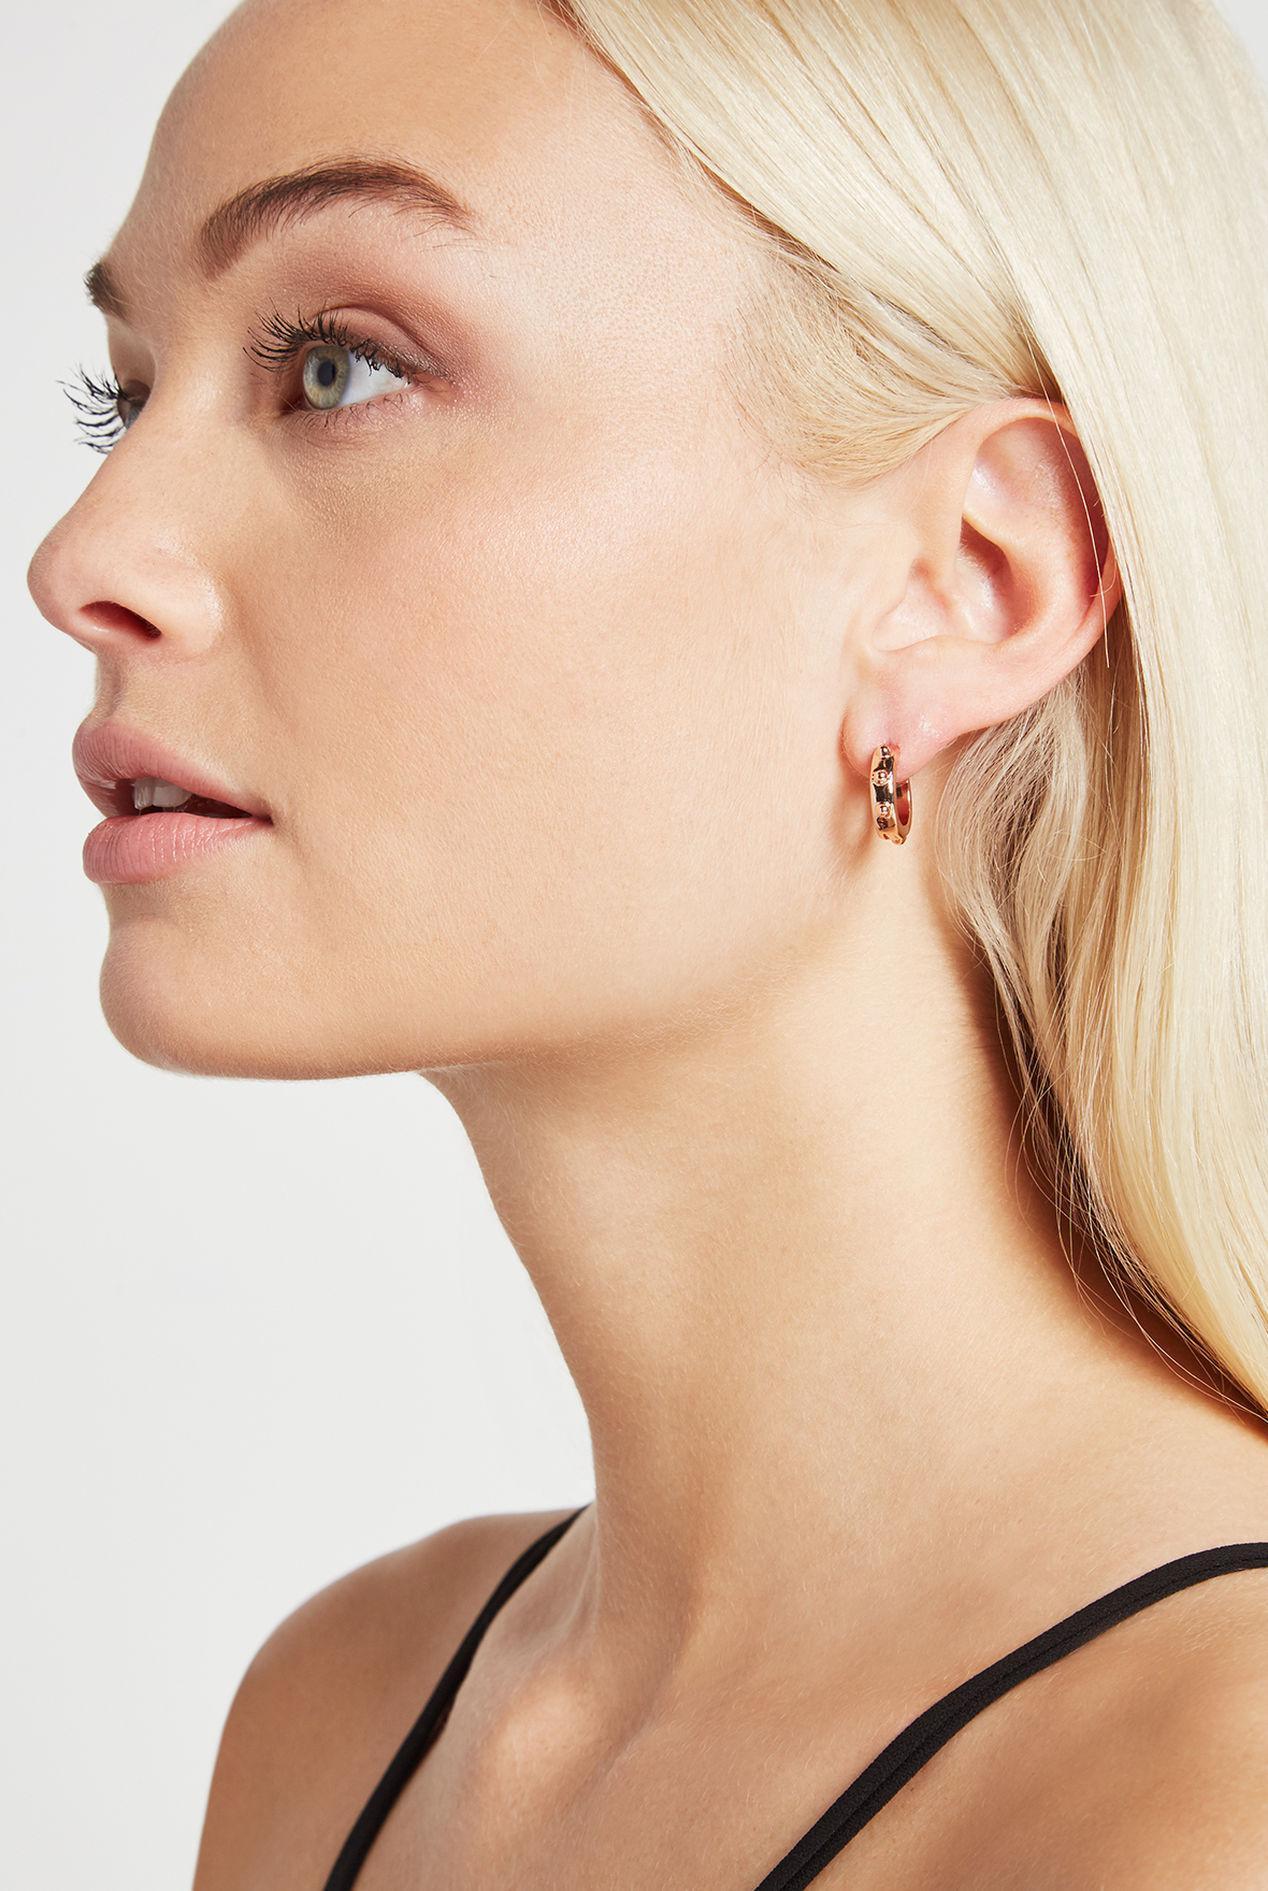 BCBGeneration Small Stud Huggie Earring Fhriga